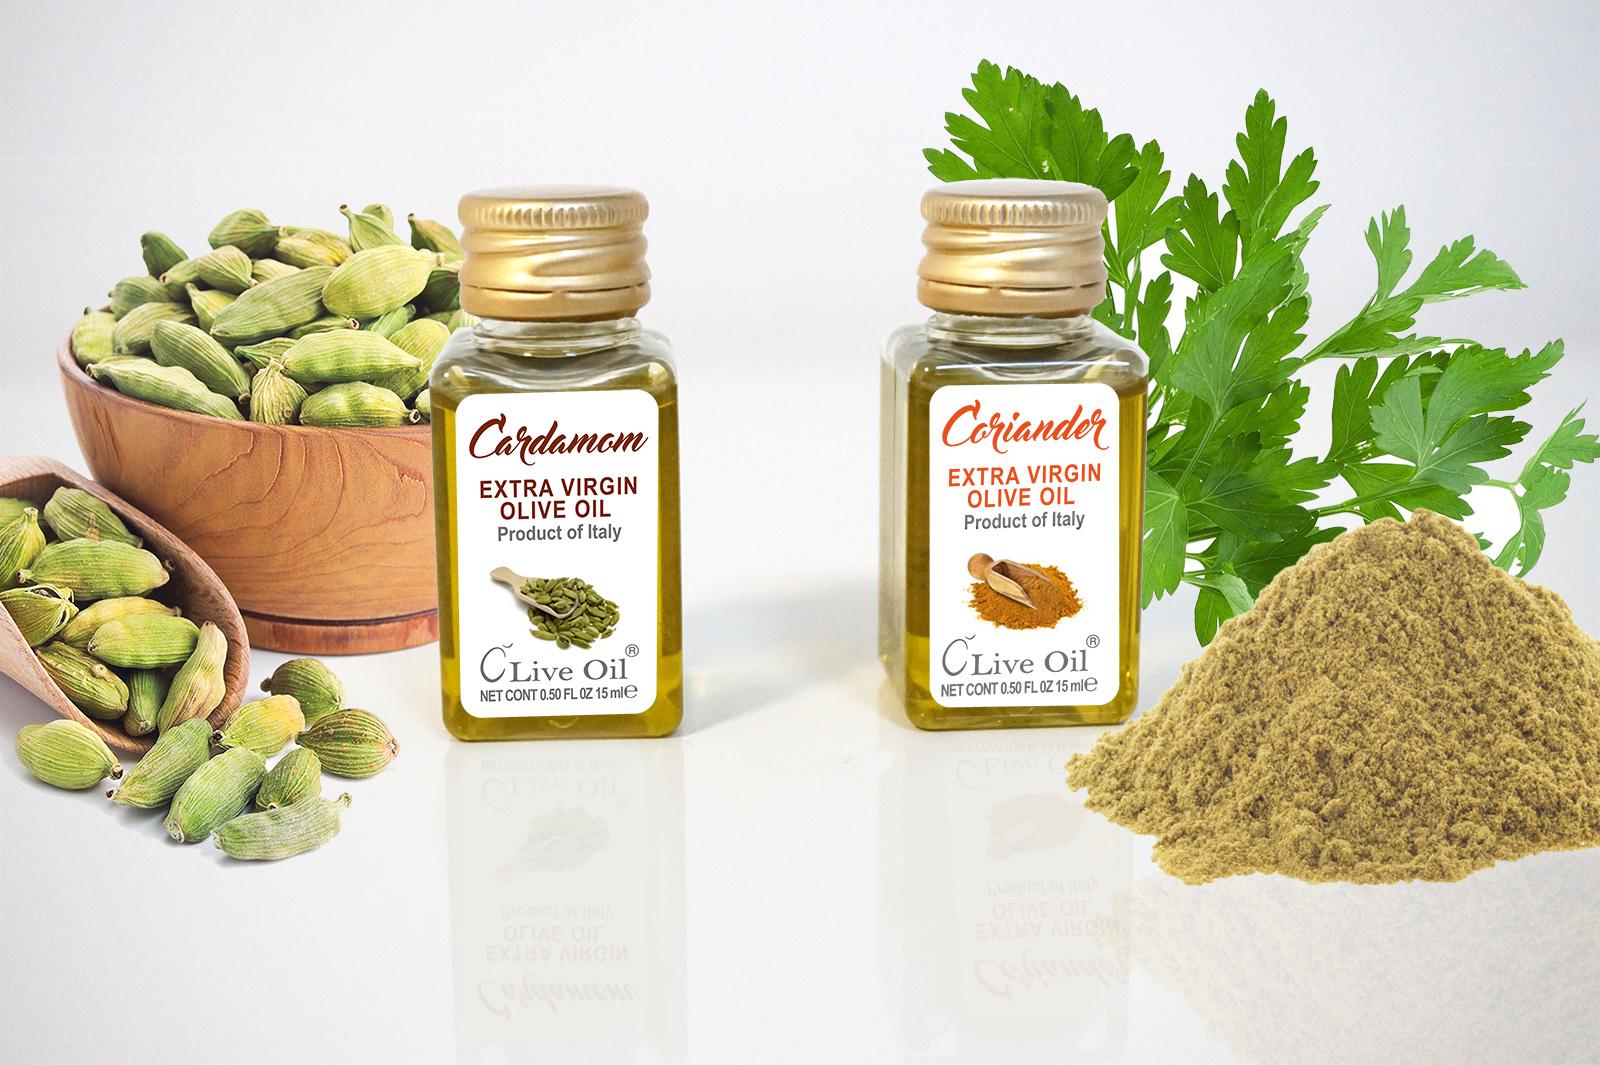 Cardamom and Coriander Extra Virgin Olive Oil - Single Serve Dressing, Live Oil